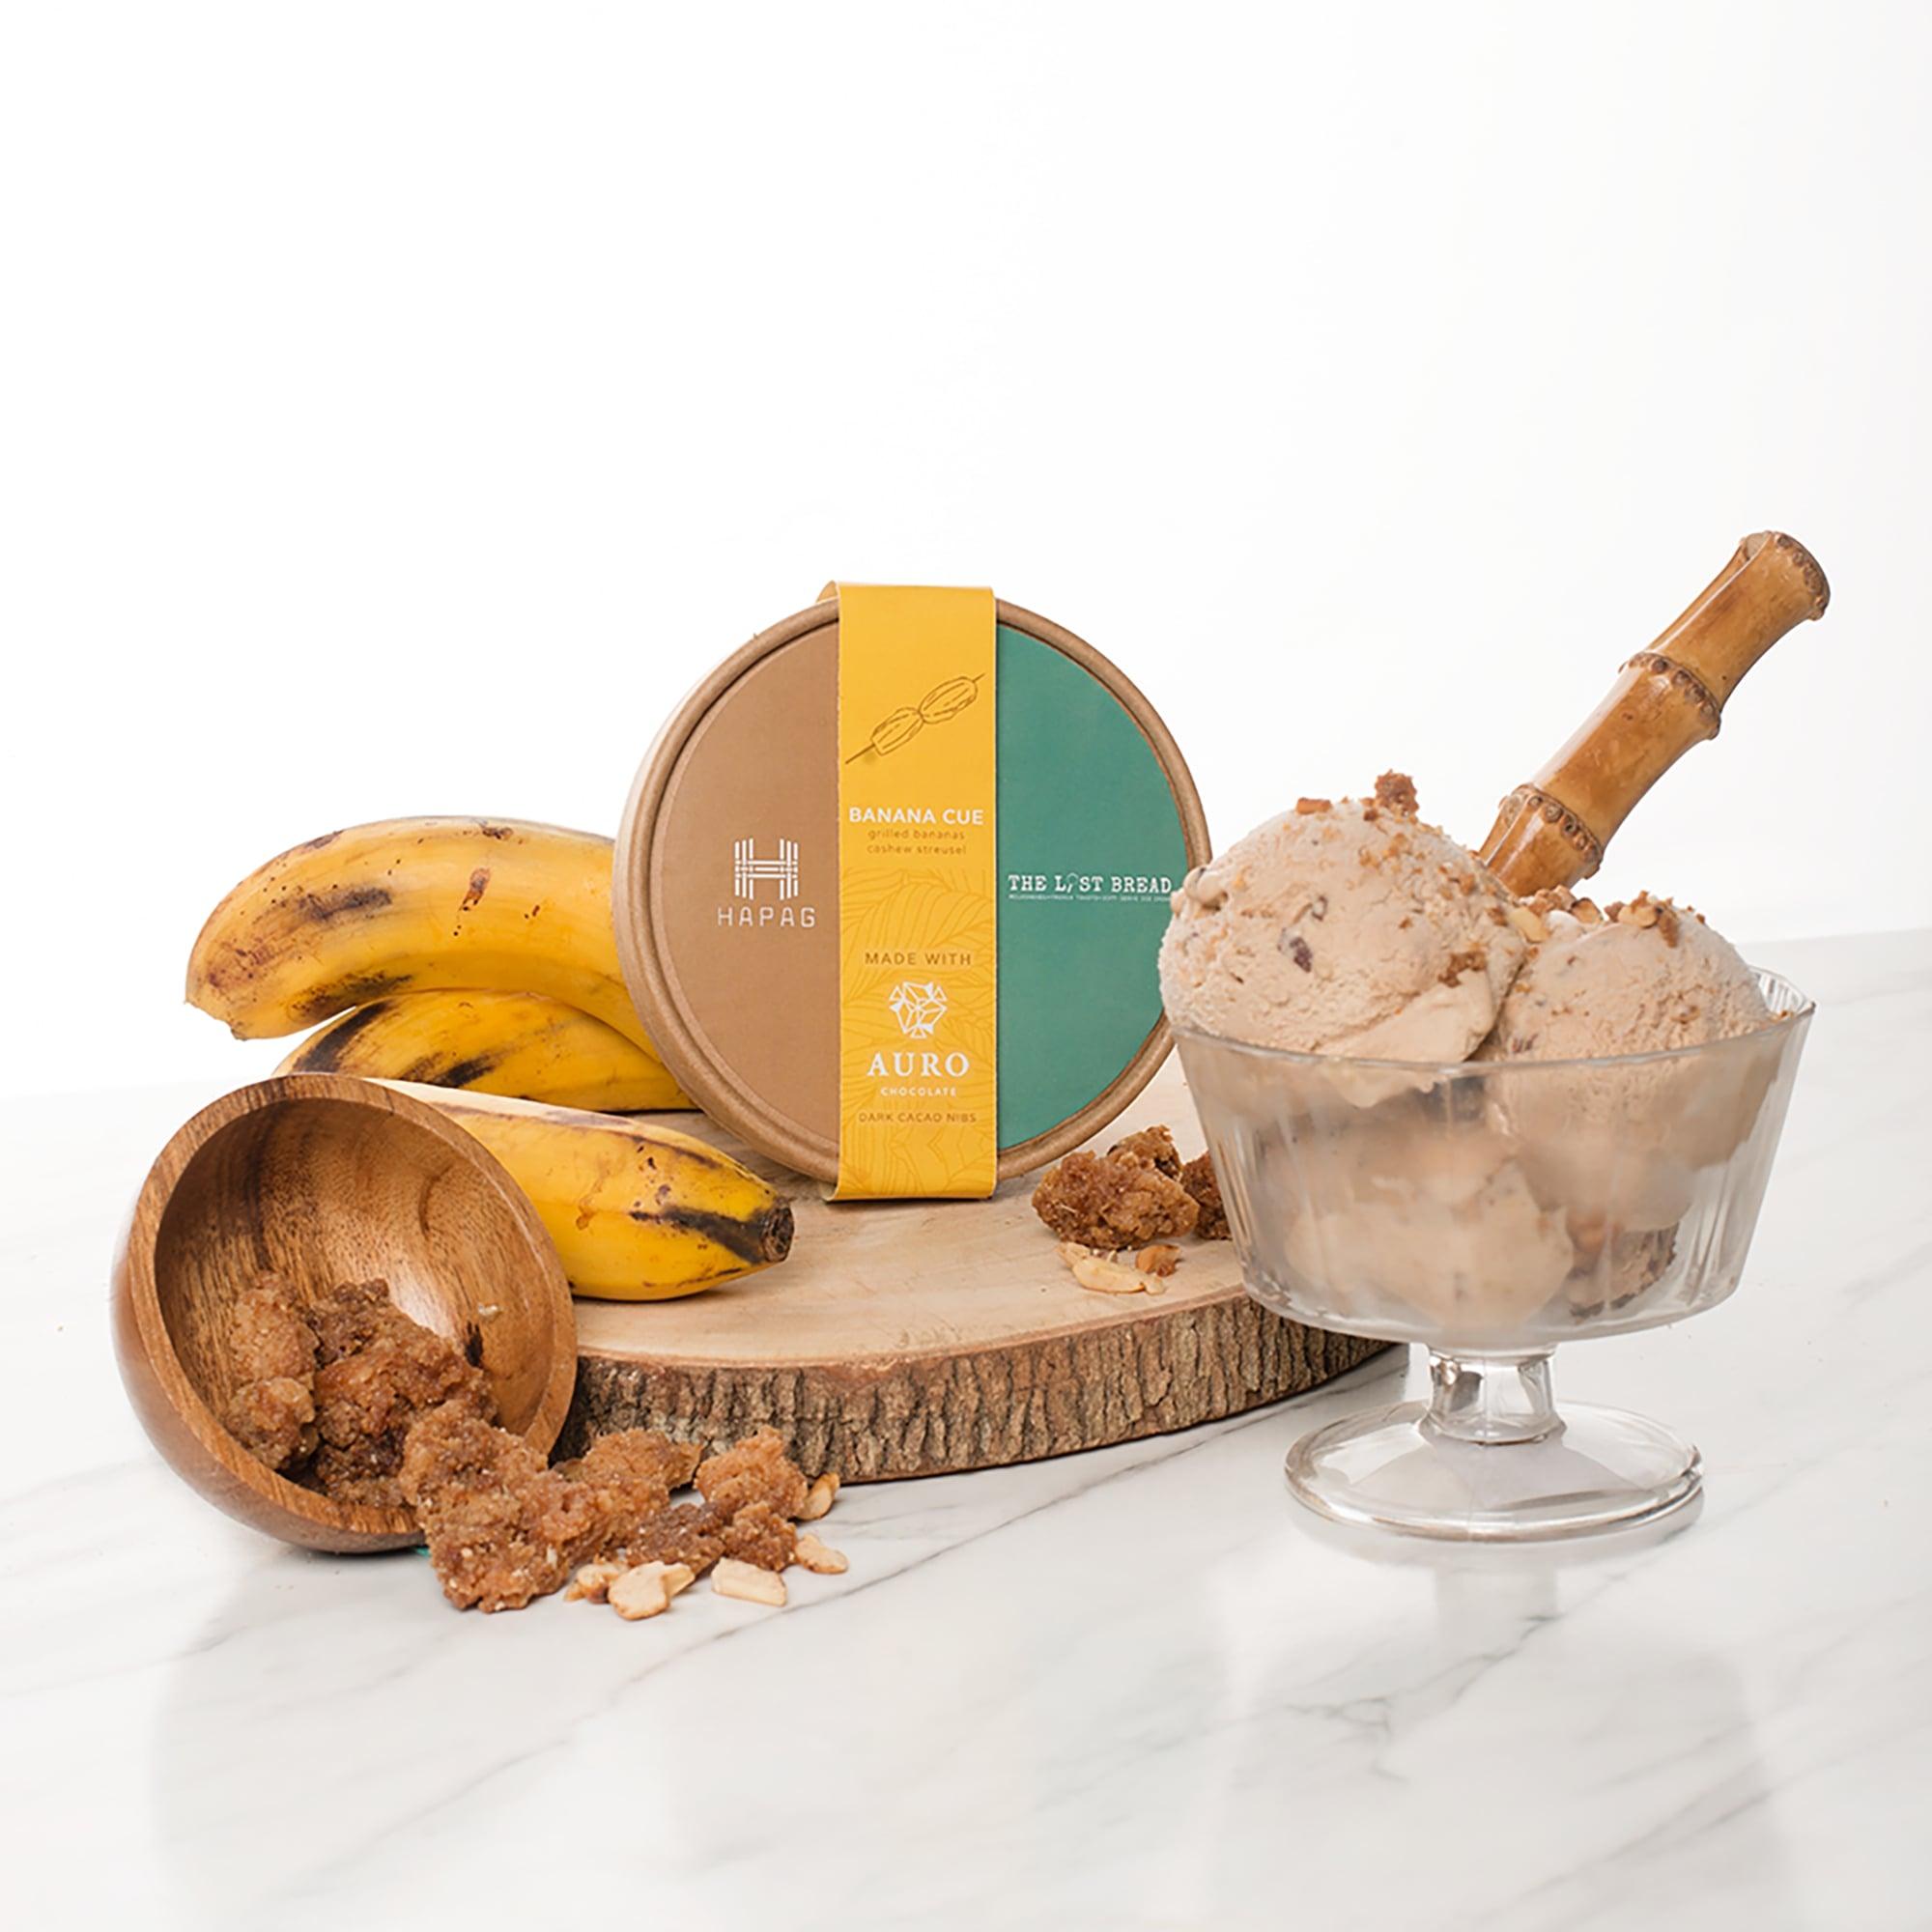 banana cue ice cream